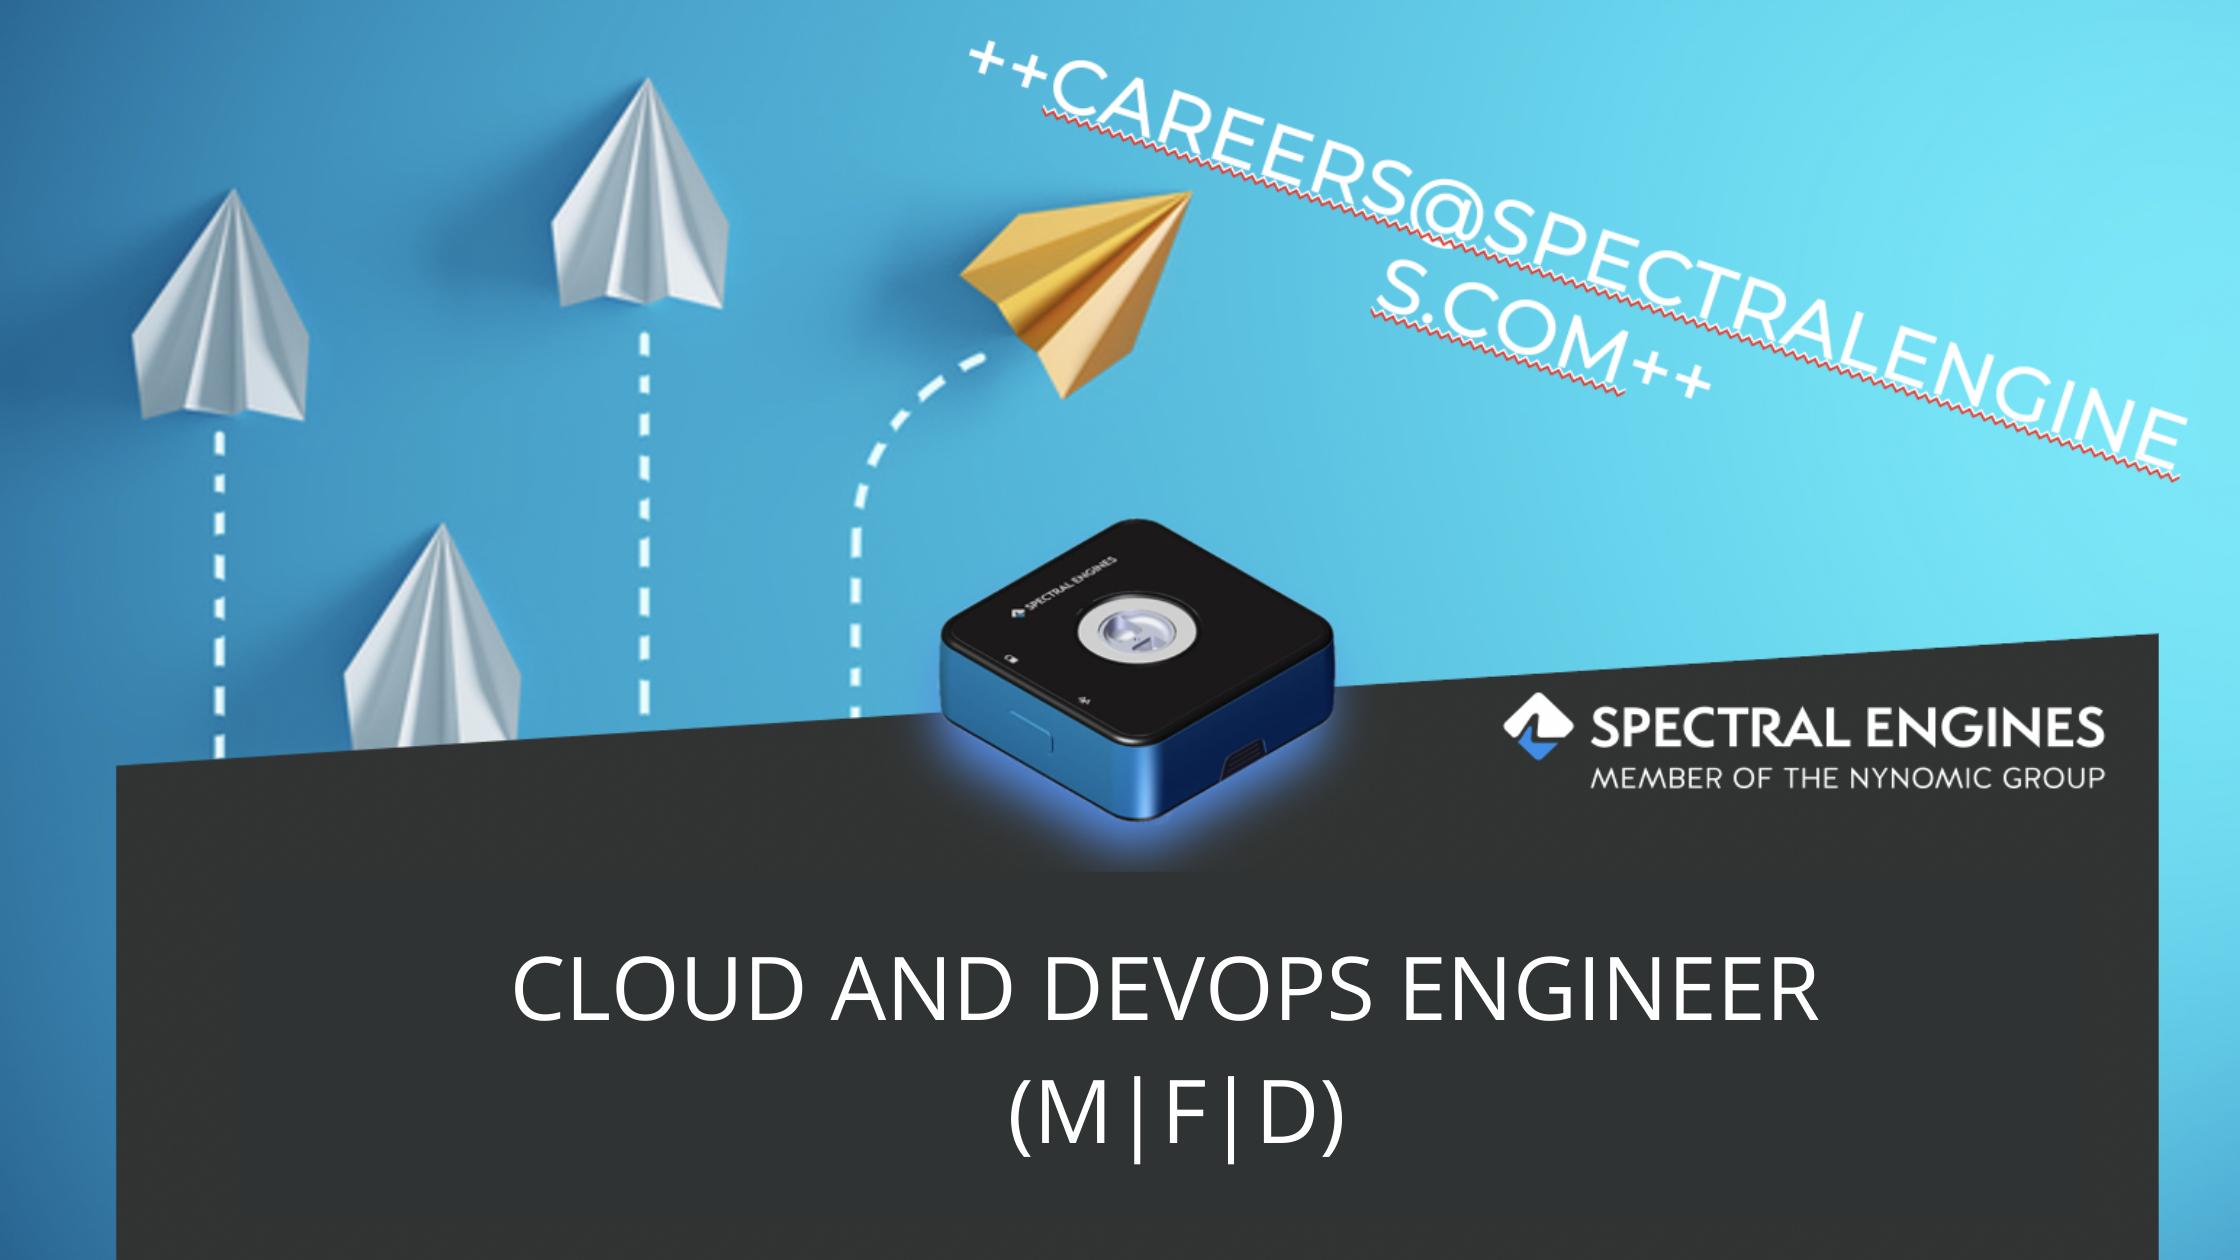 Cloud and DevOps Engineer (M|F|D)